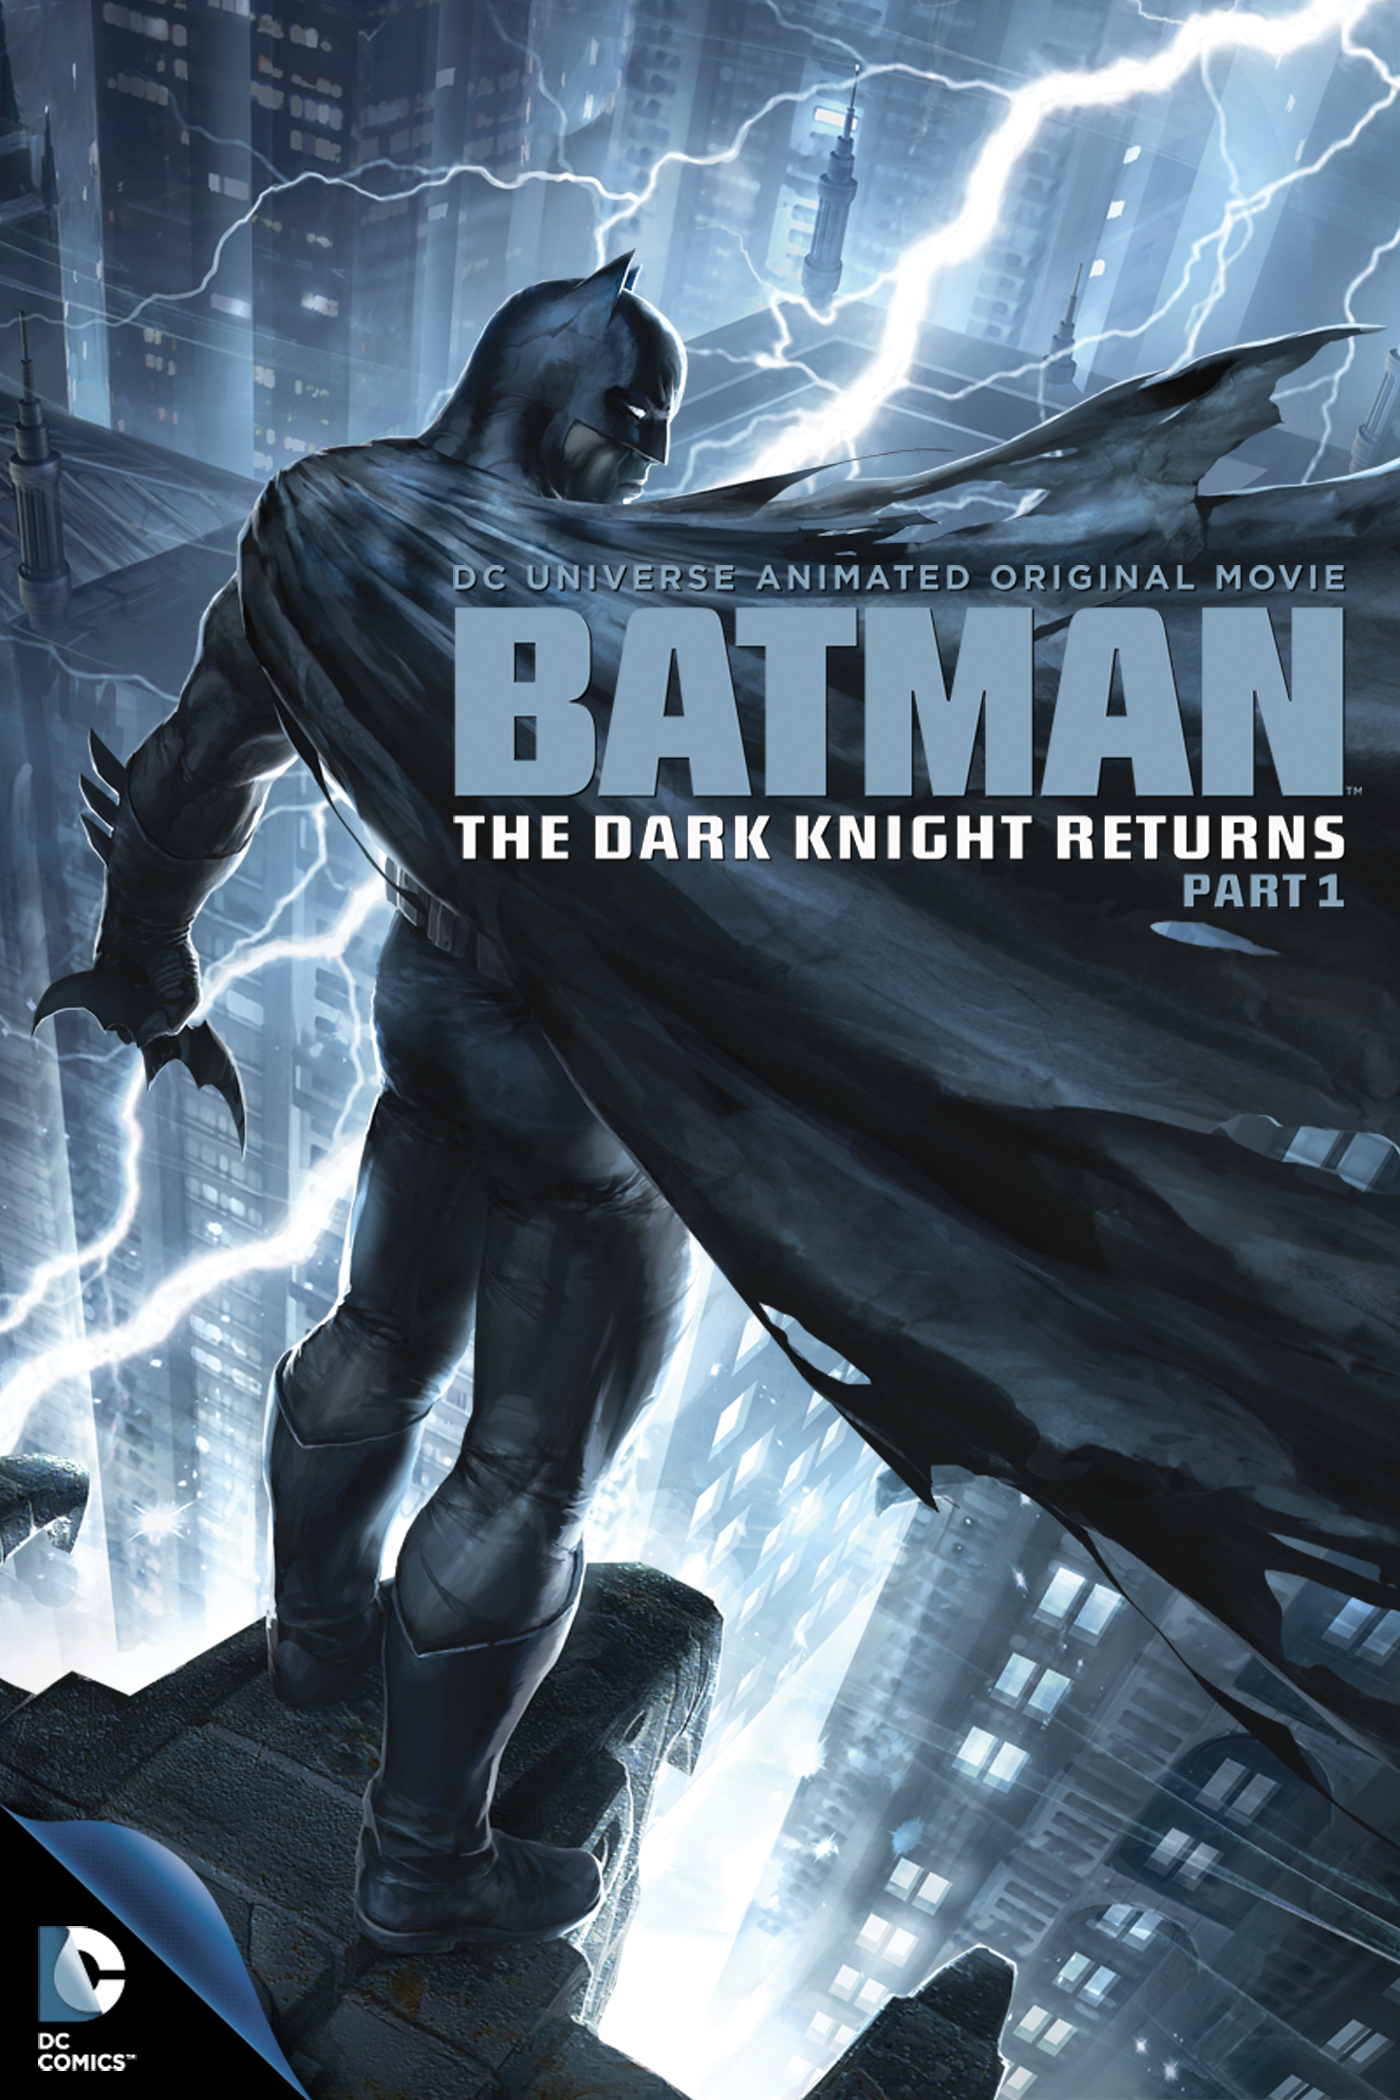 batman-the-dark-knight-returns-part-1-poster